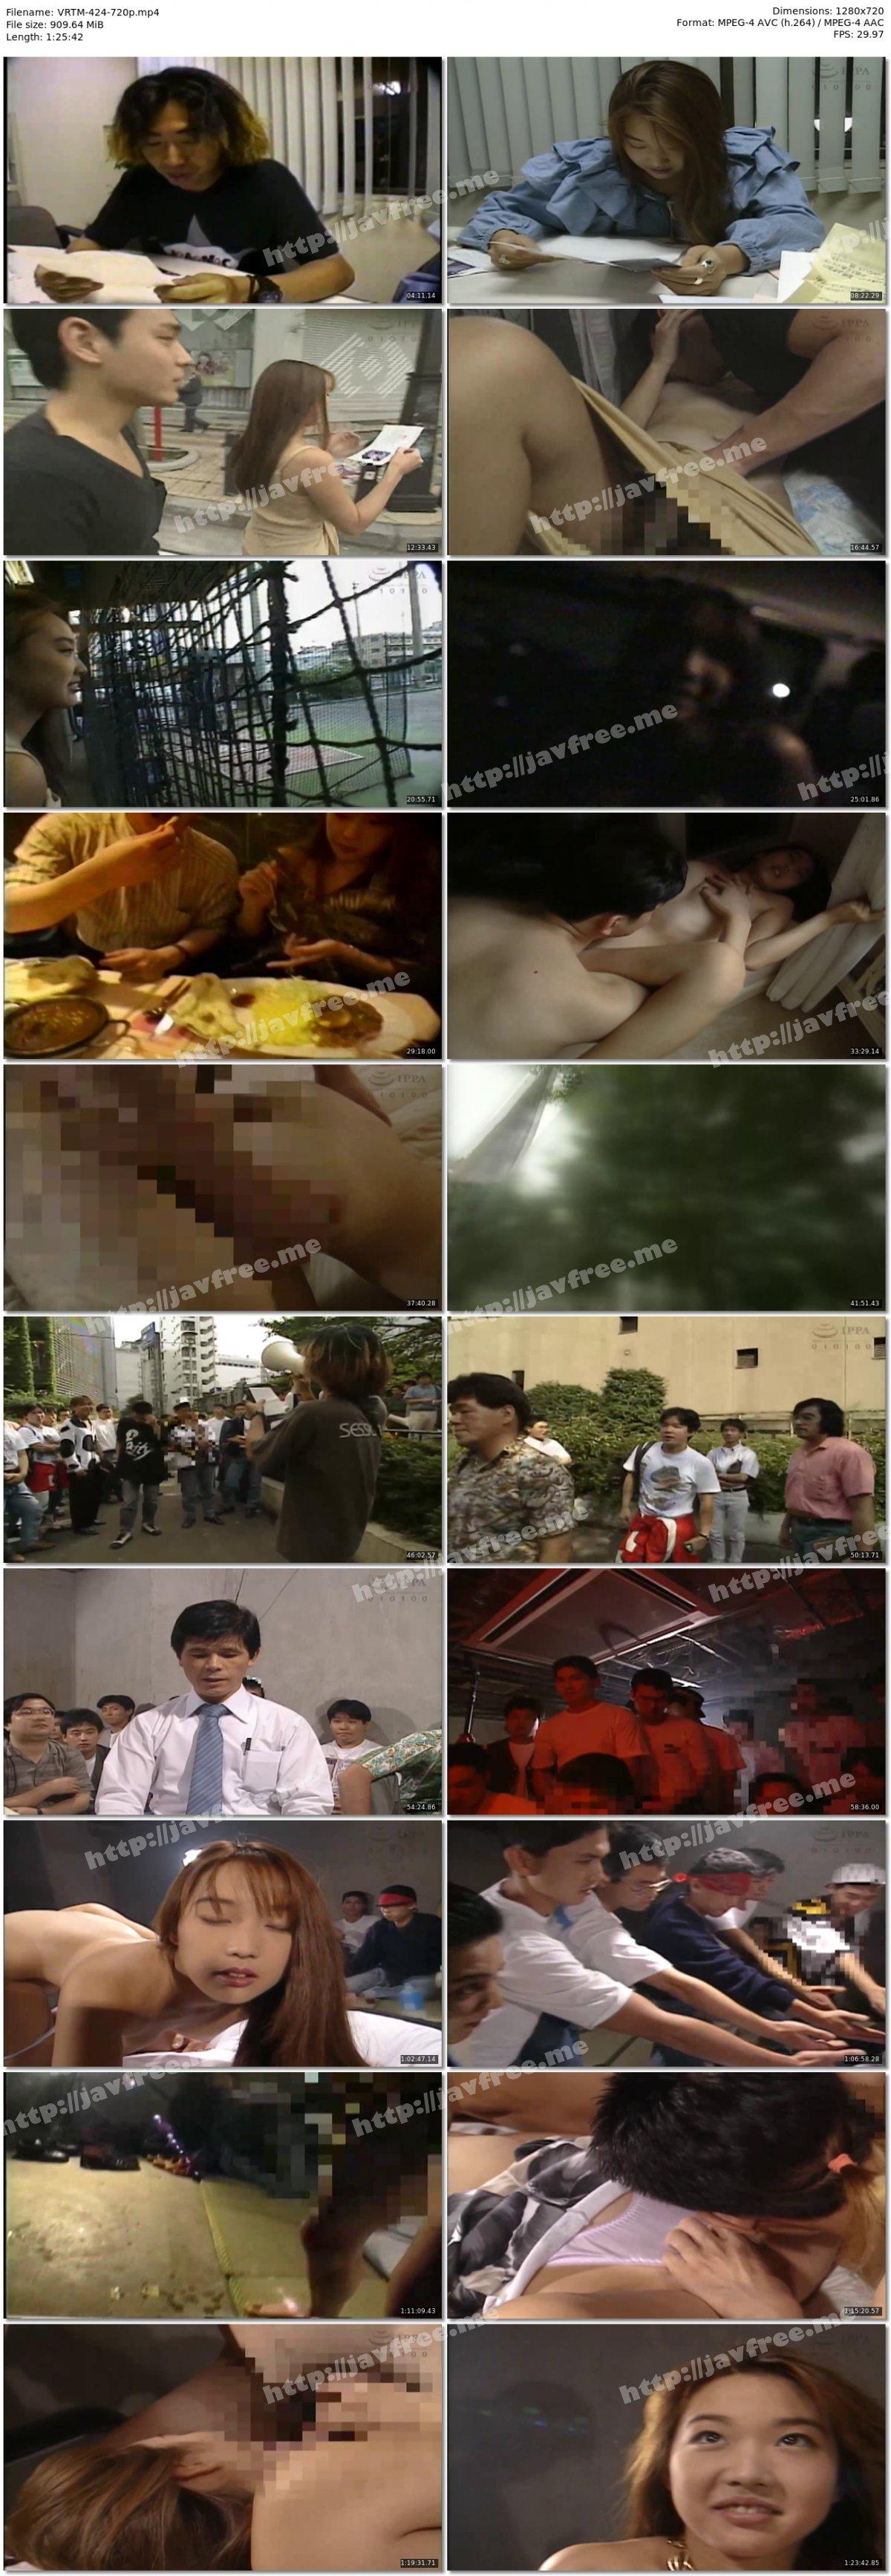 [HD][VRTM-424] 素人参加募集ビデオ 憂木瞳としてみませんか? - image VRTM-424-720p on https://javfree.me